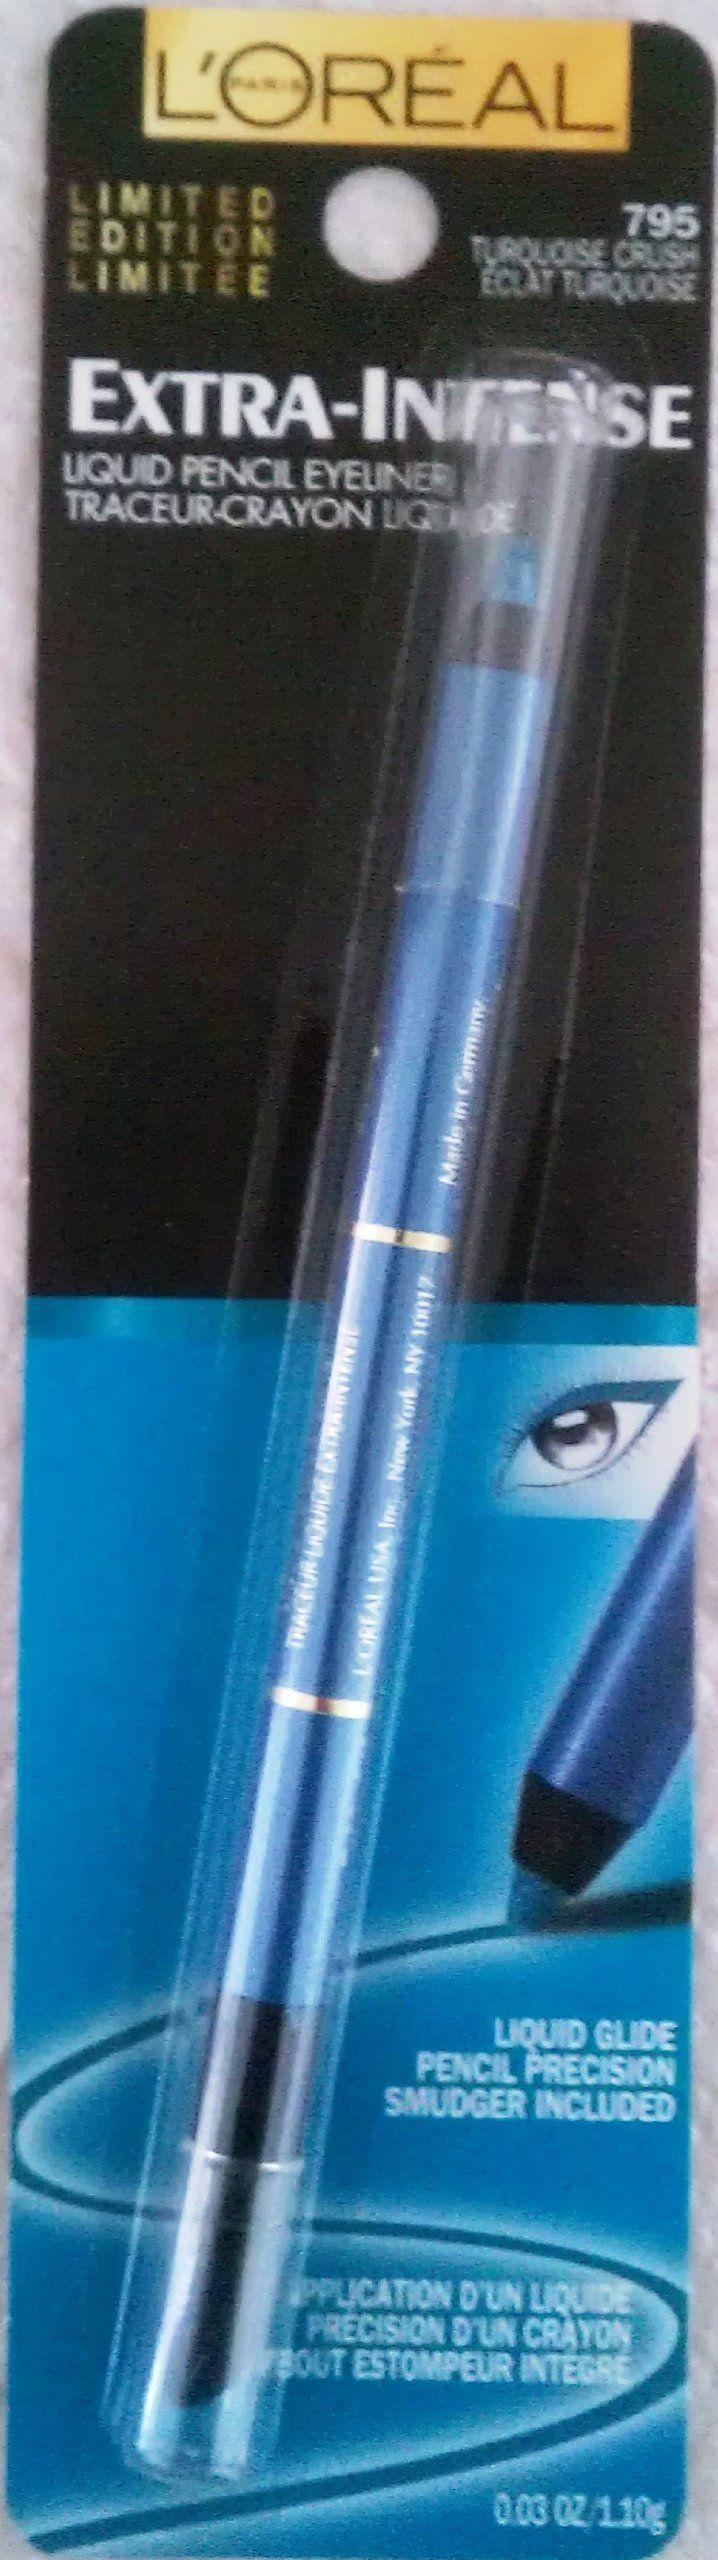 L'oreal Voluminous Extra Intense Liquid Pencil Eyeliner #795 Turquoise Crush, Retractable. EYELINER.